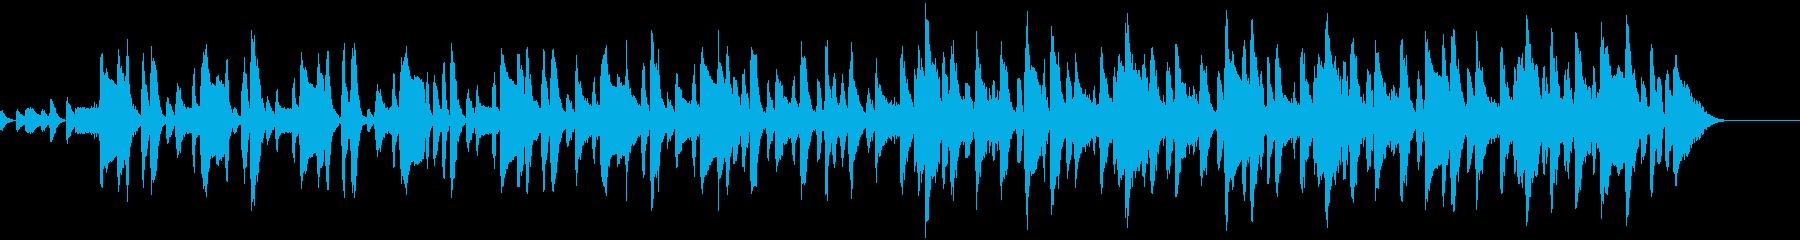 youtuberが使っているような音楽の再生済みの波形